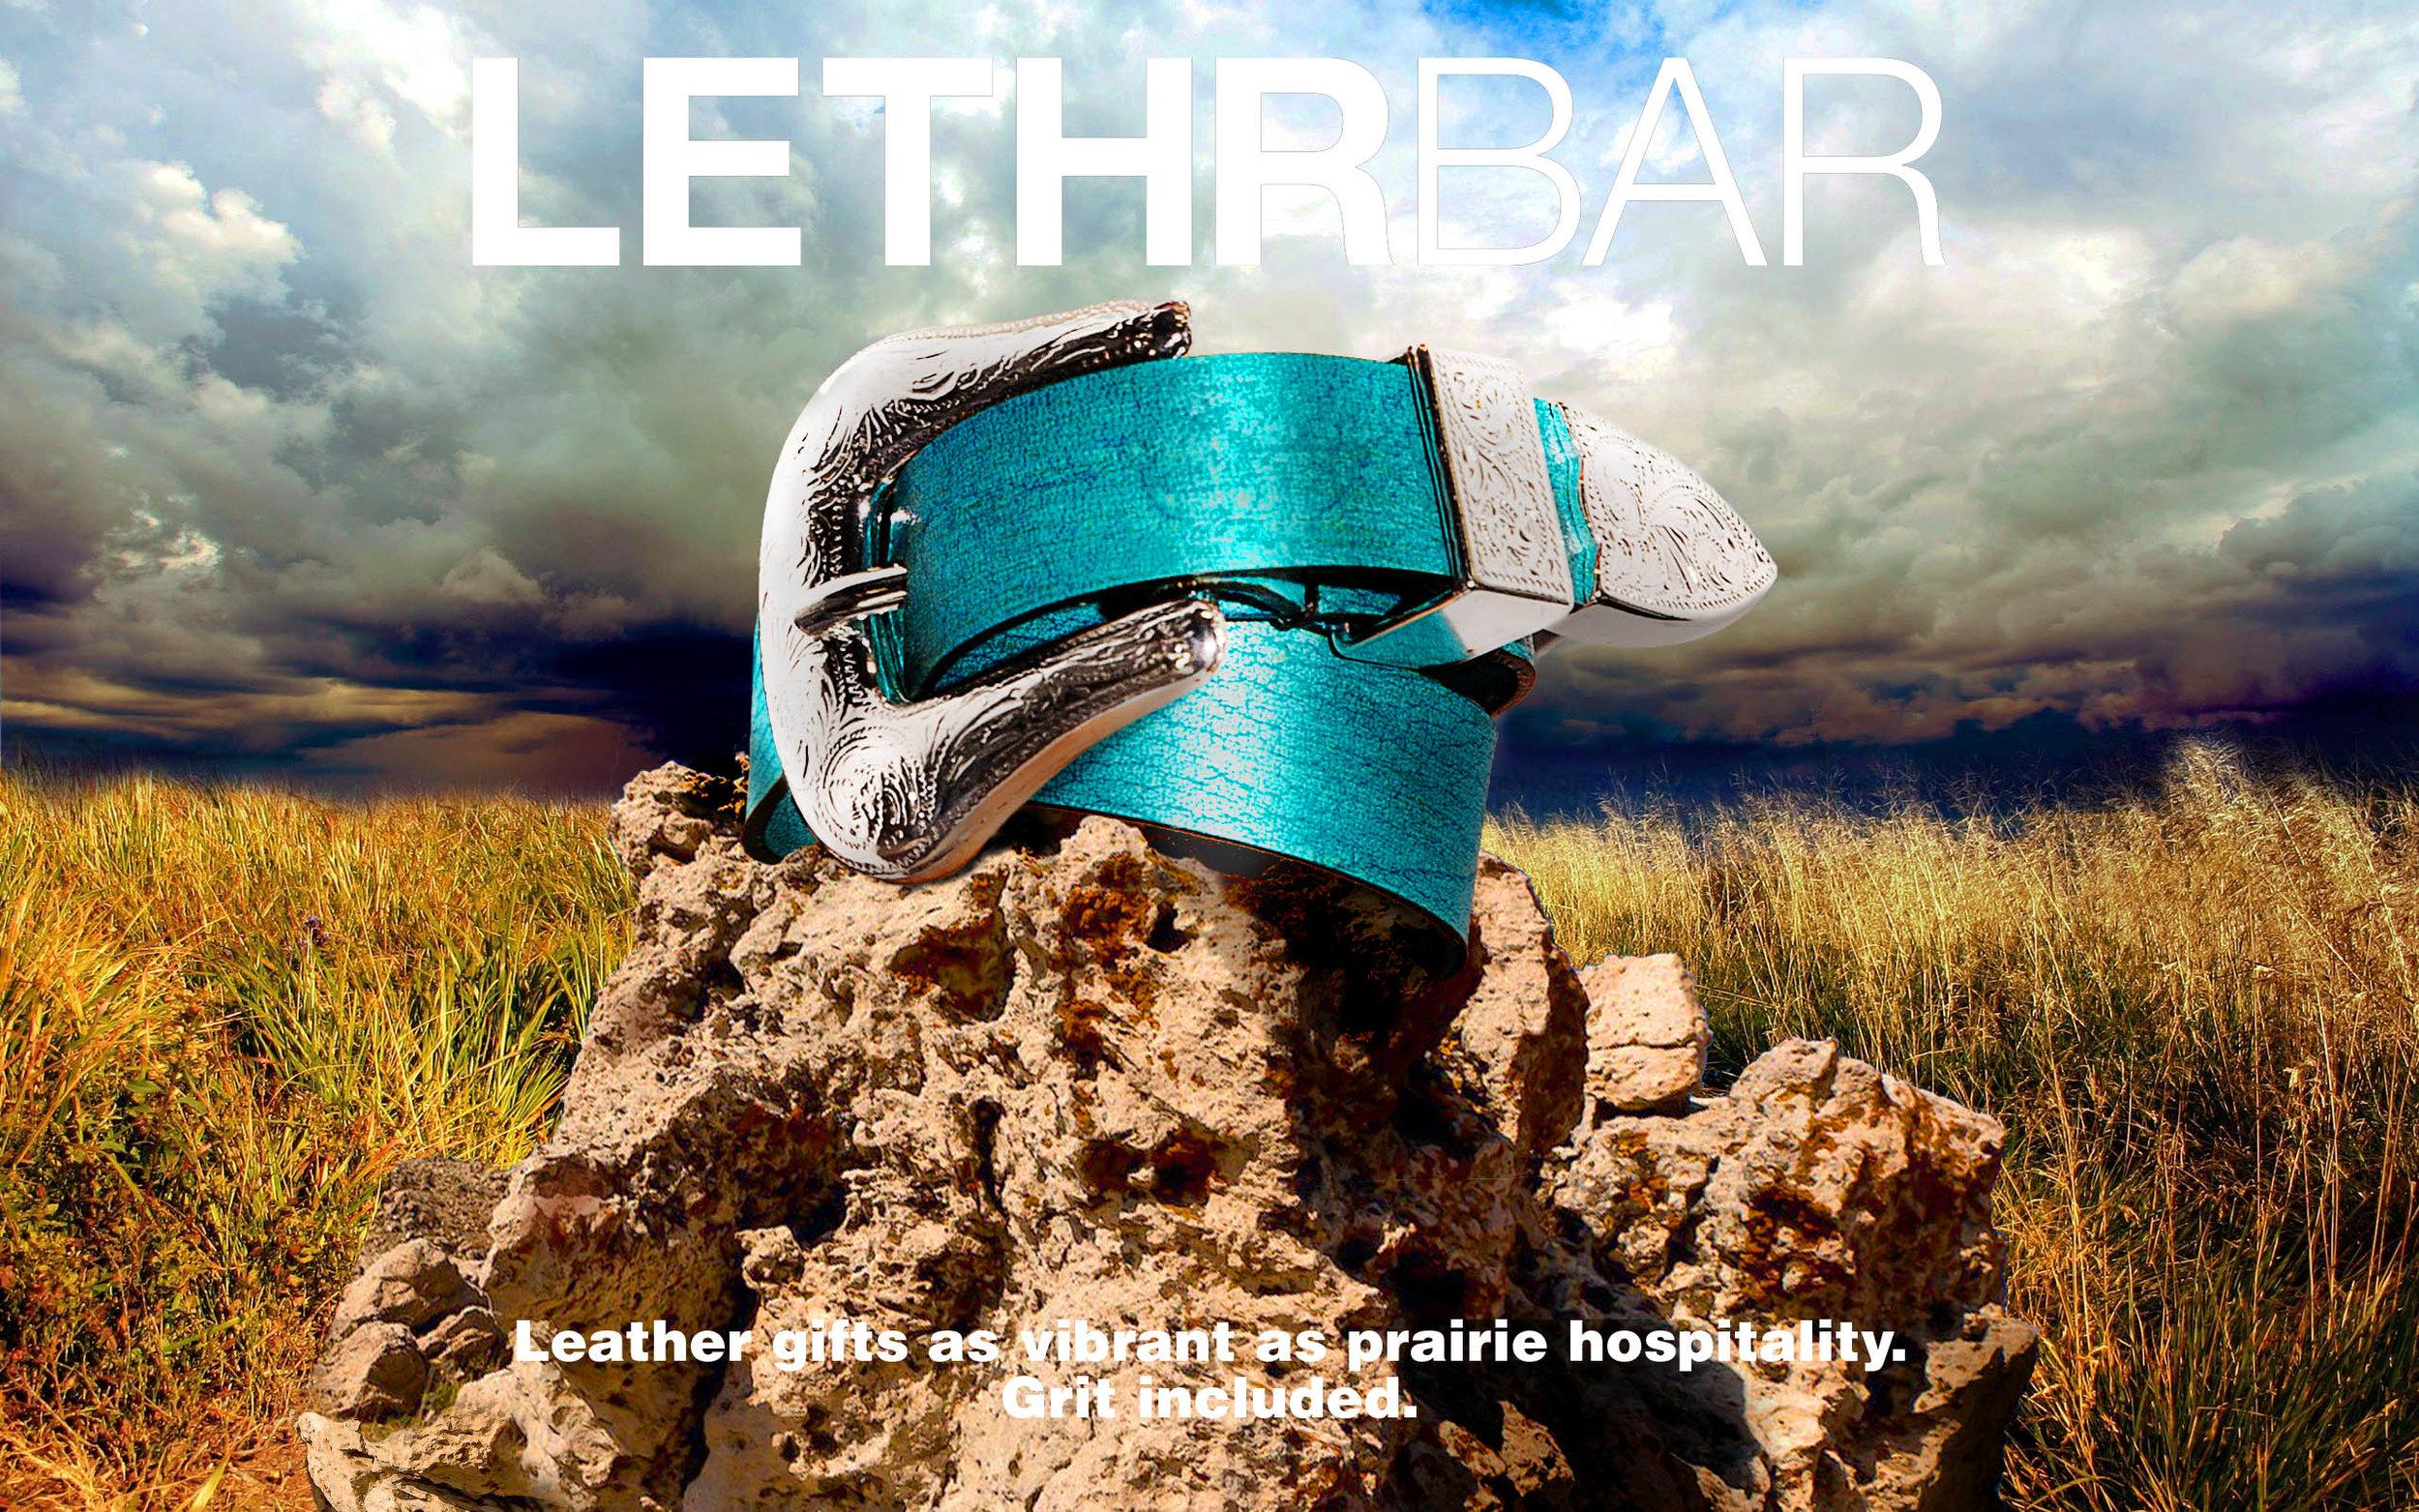 LETHRBAR.5.jpg